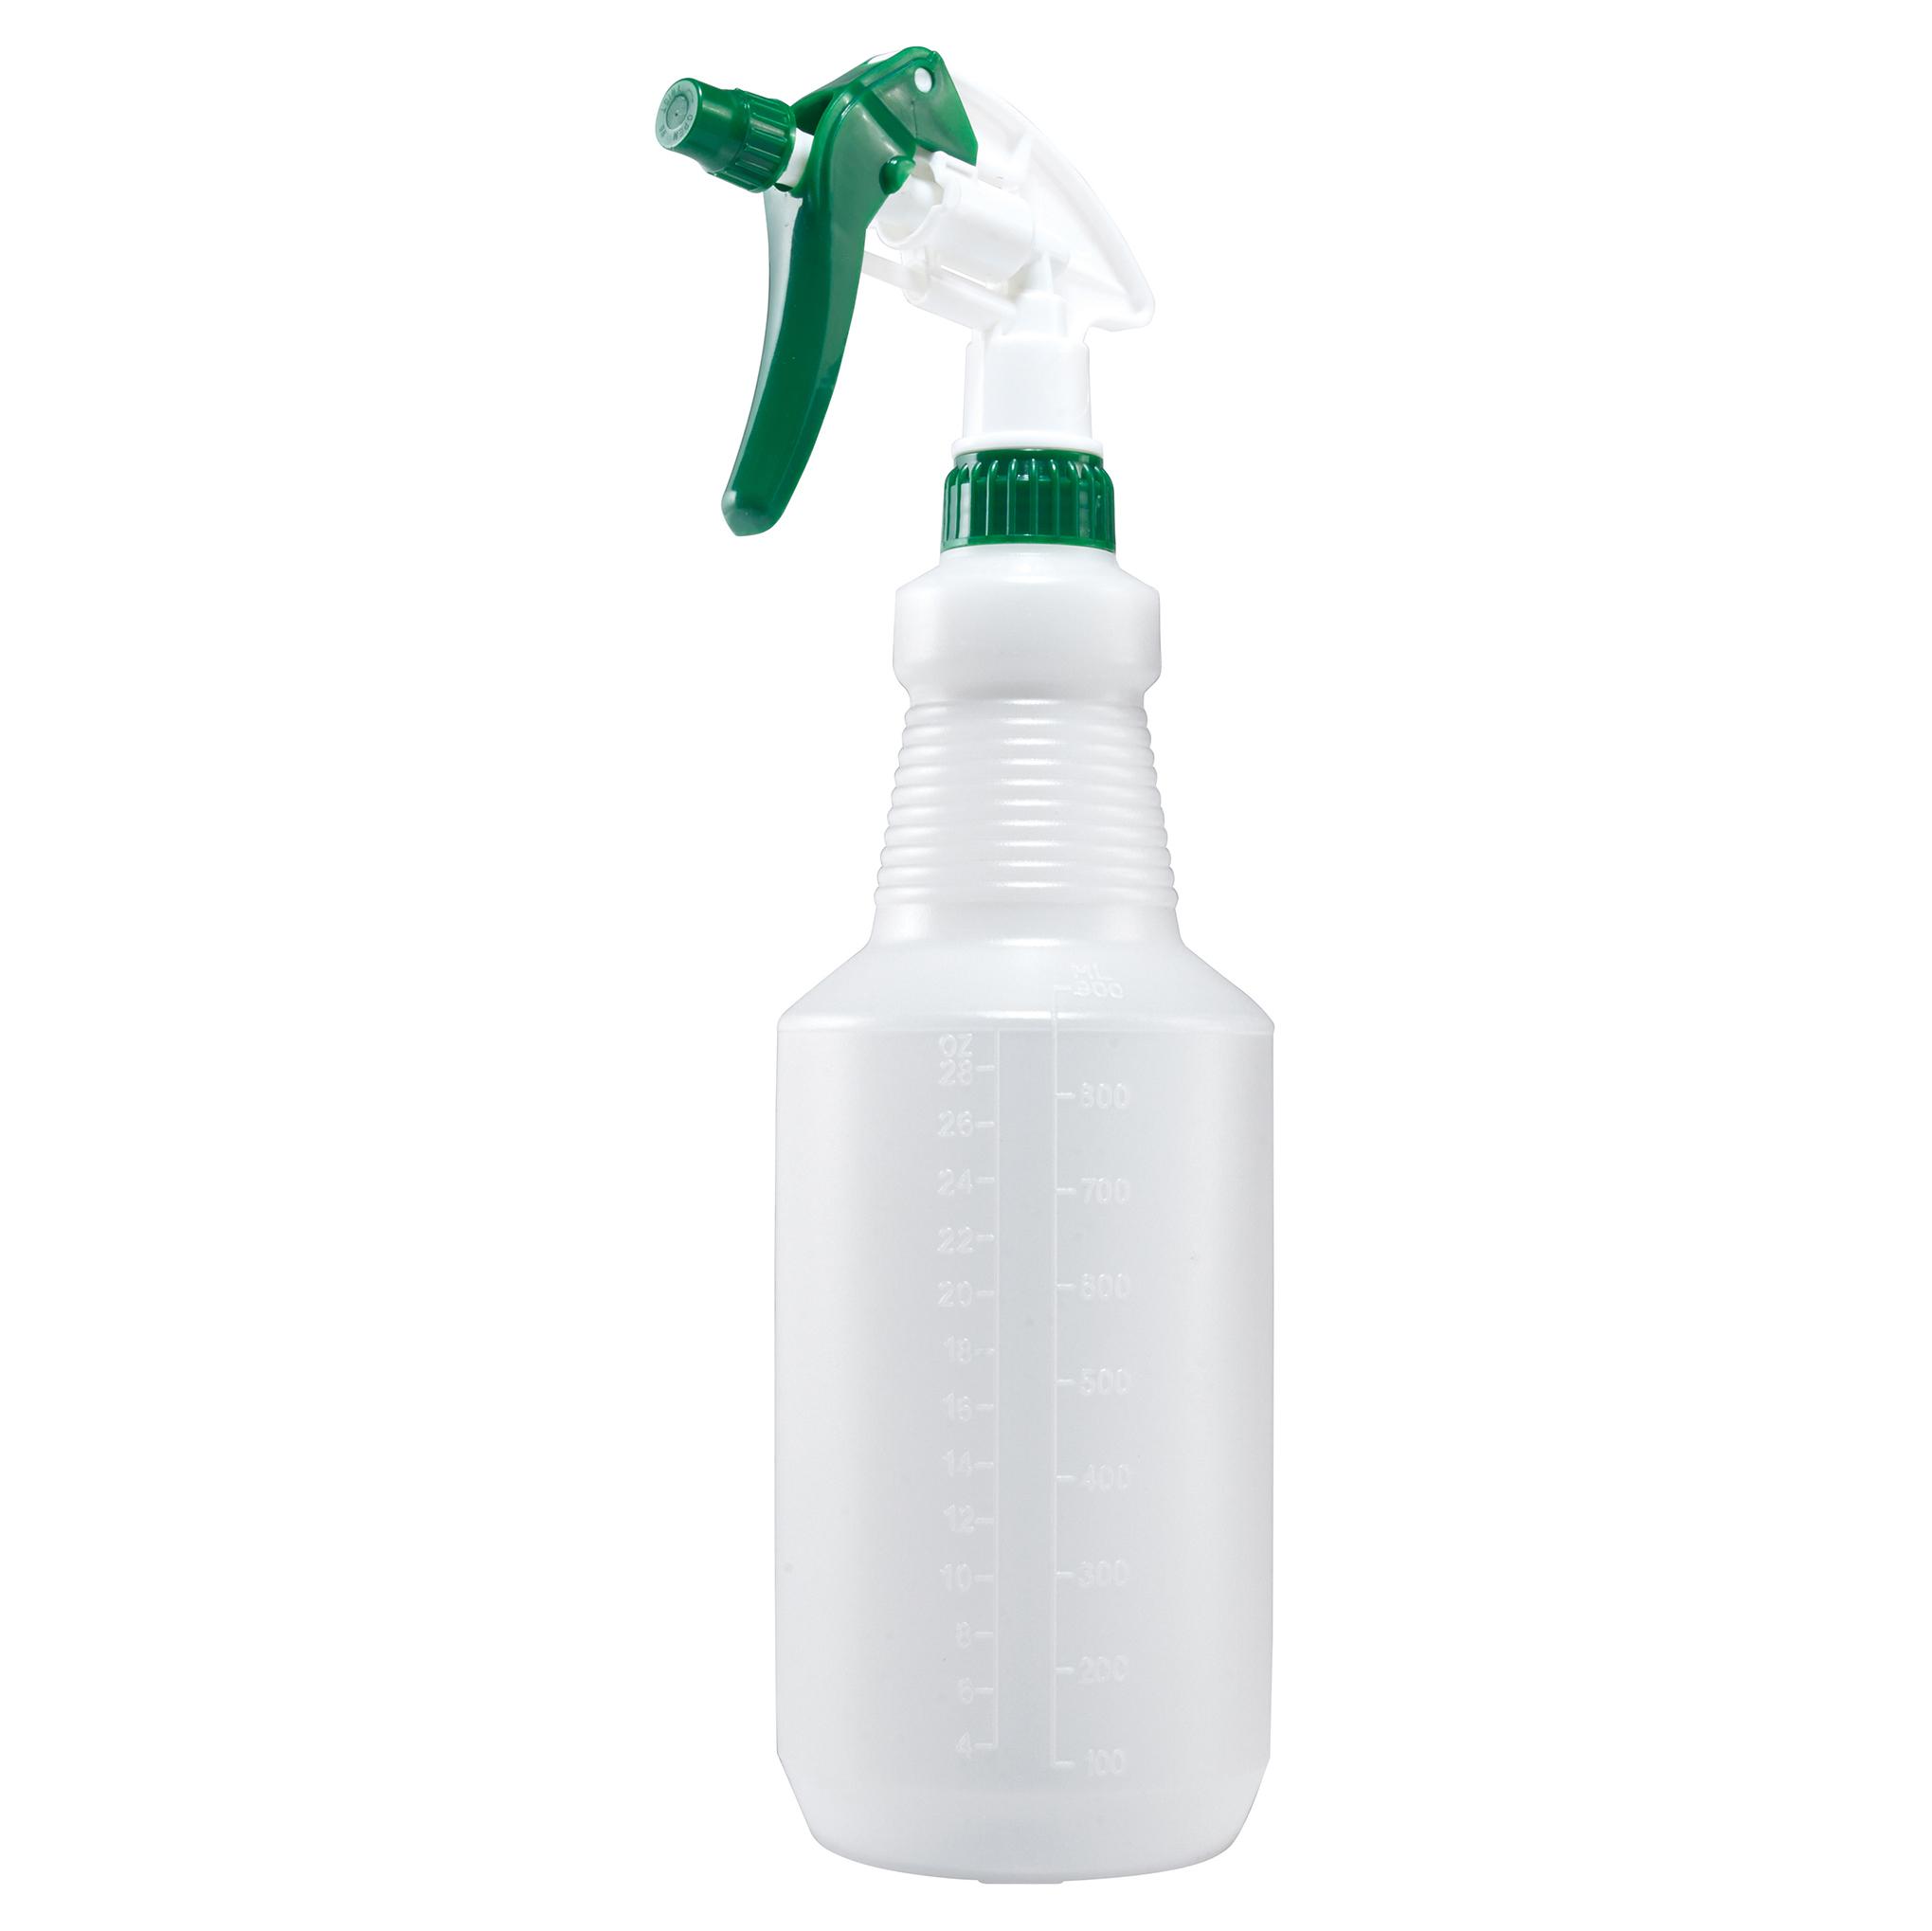 28 oz. Spray Bottle, Winco PSR-9